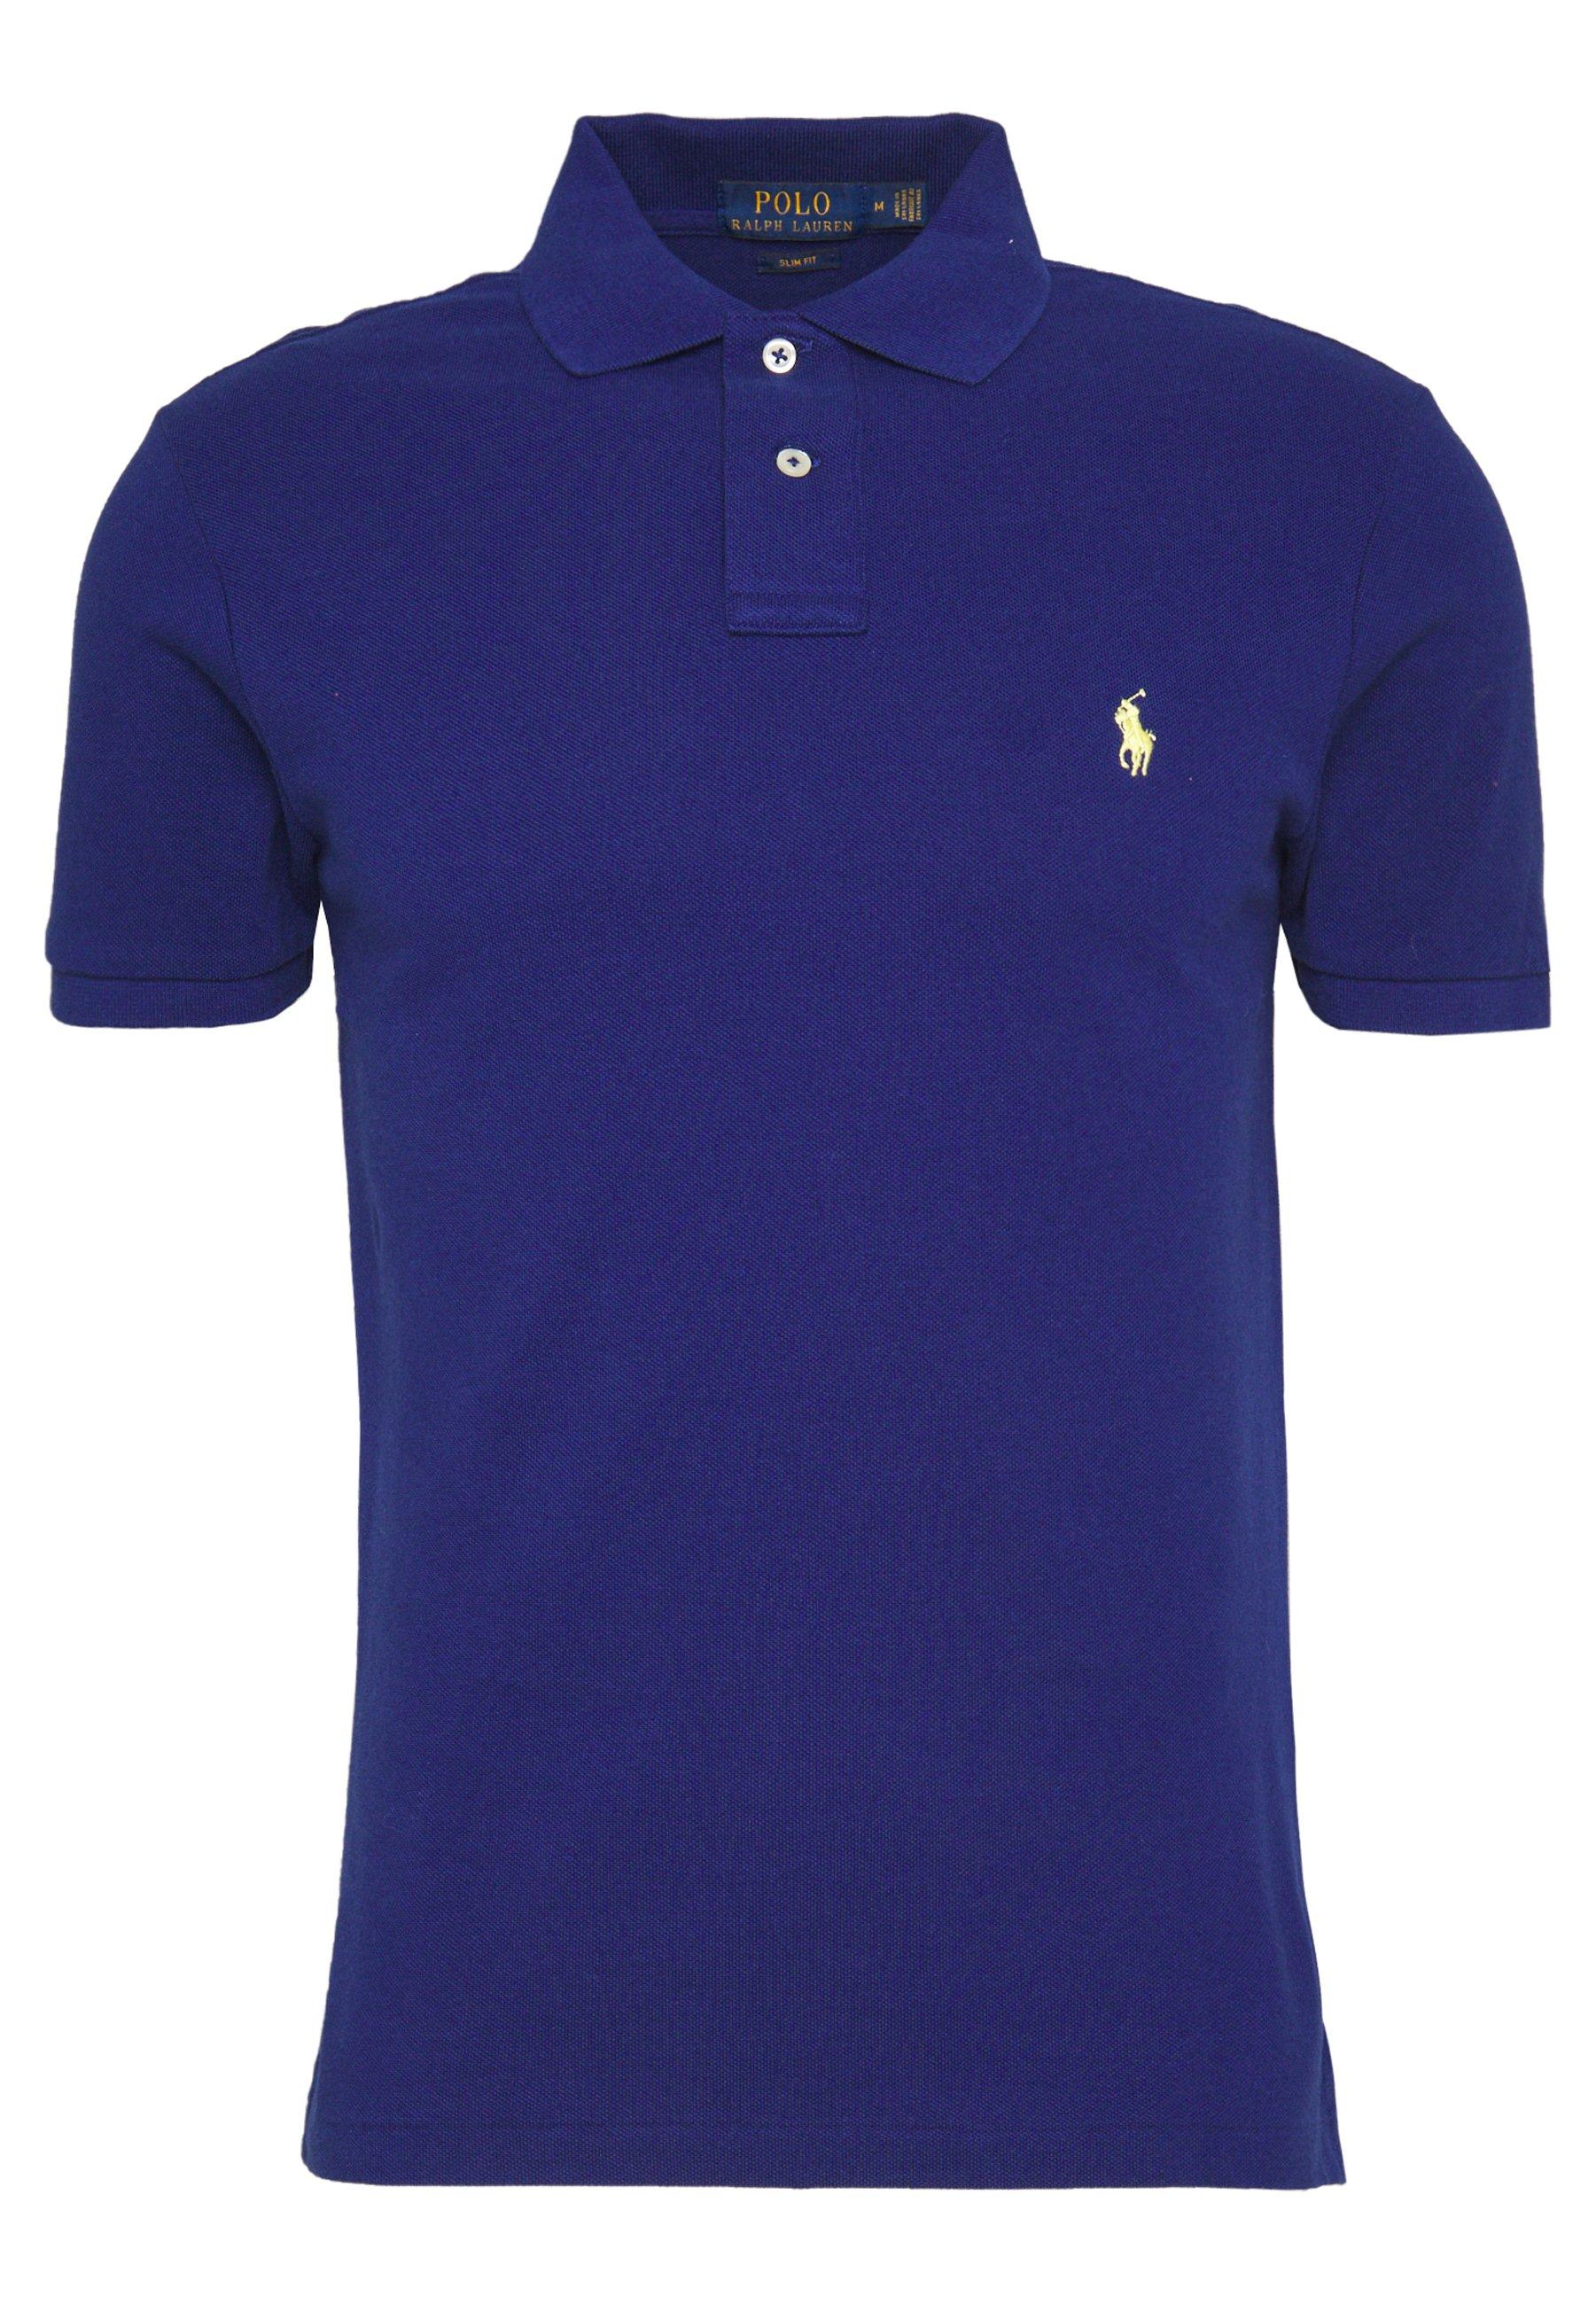 Polo Ralph Lauren - Chalet Purple TXavG